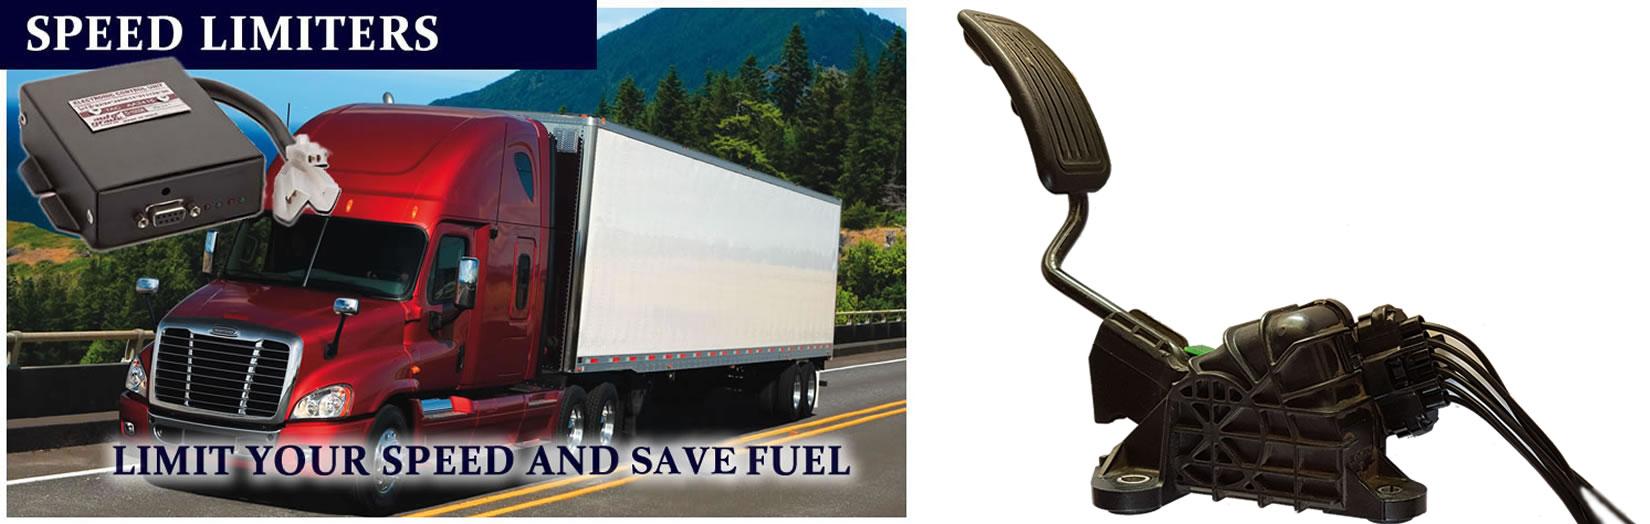 Fuel Savings::AUTOMOTIVE GAUGES AND MARINE GAUGES